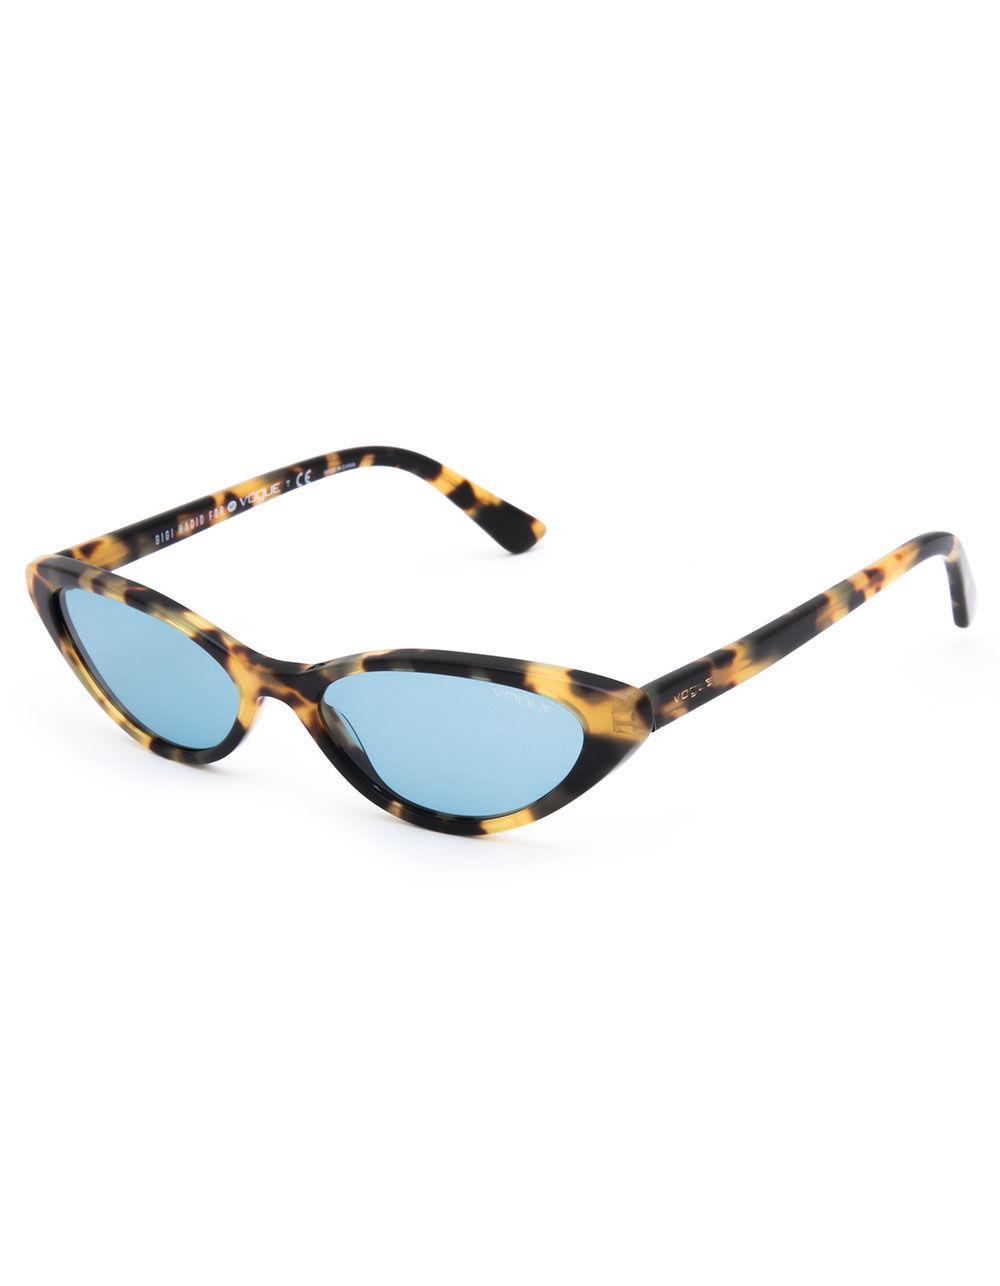 a97ee028df51 Vogue Eyewear Gigi Hadid For Vogue Vo5237s Tortoise   Blue ...